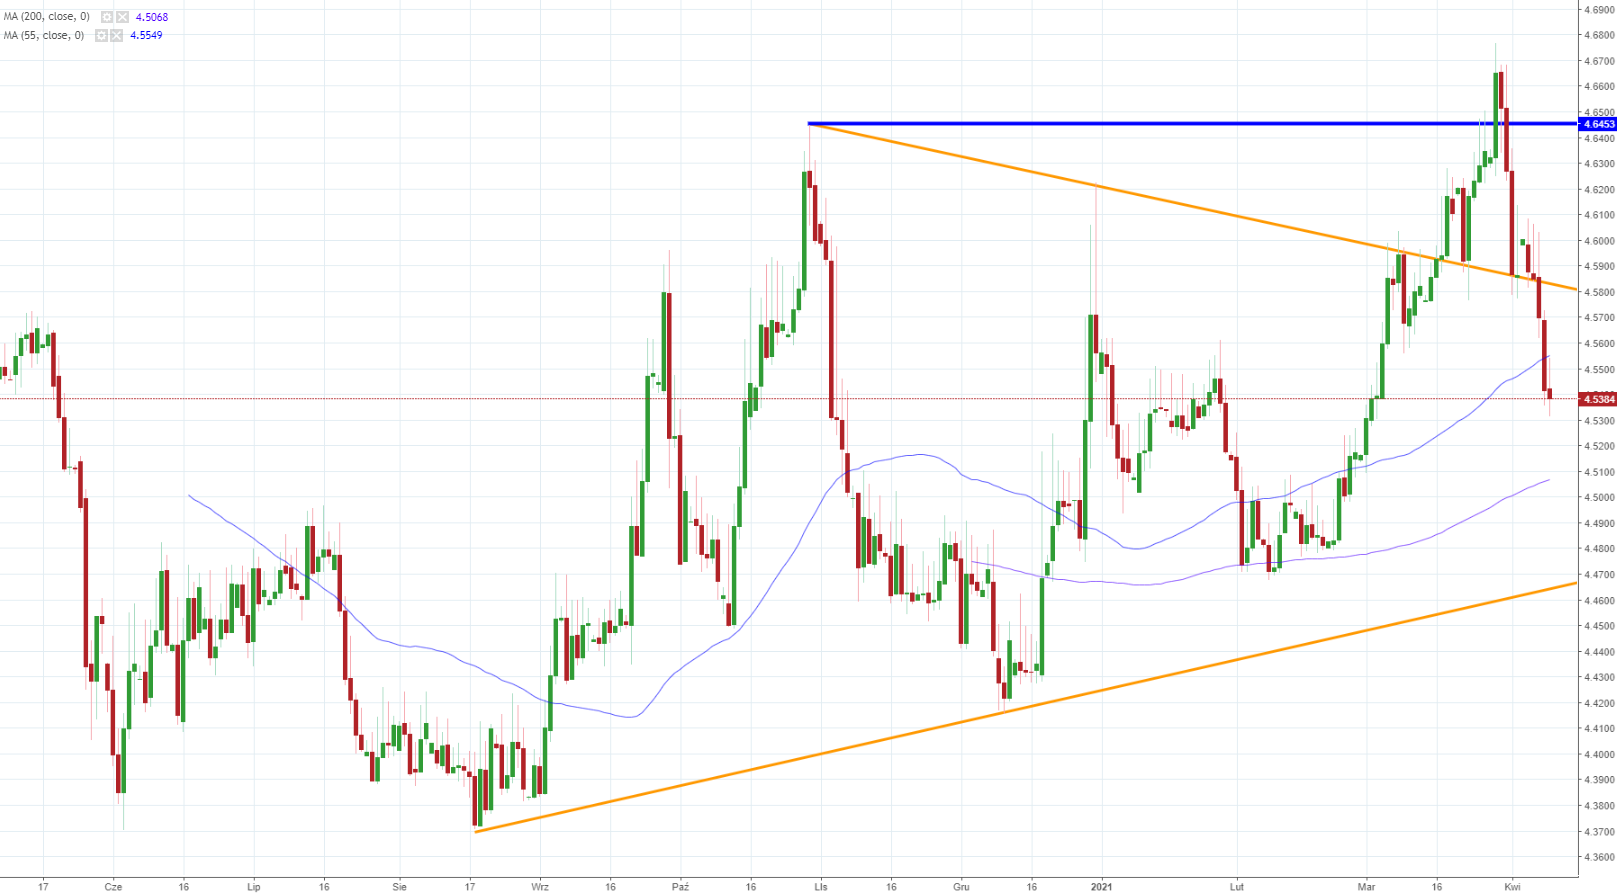 Notowania EUR/PLN, interwał: D1, źródło: TMS Brokers